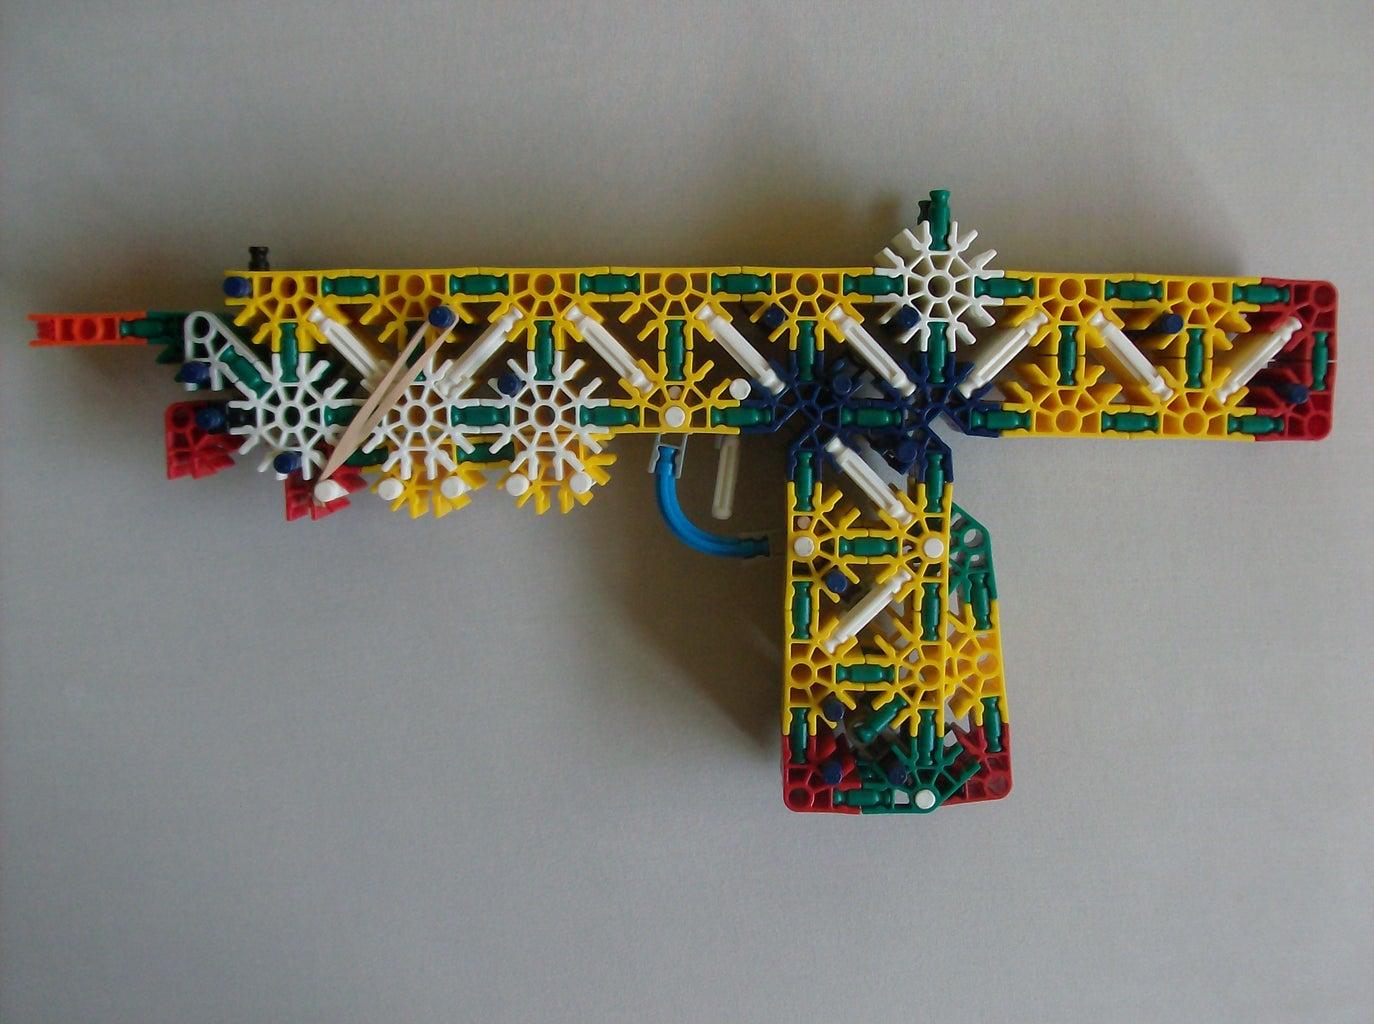 K'nex - PM-63 RAK Instructions